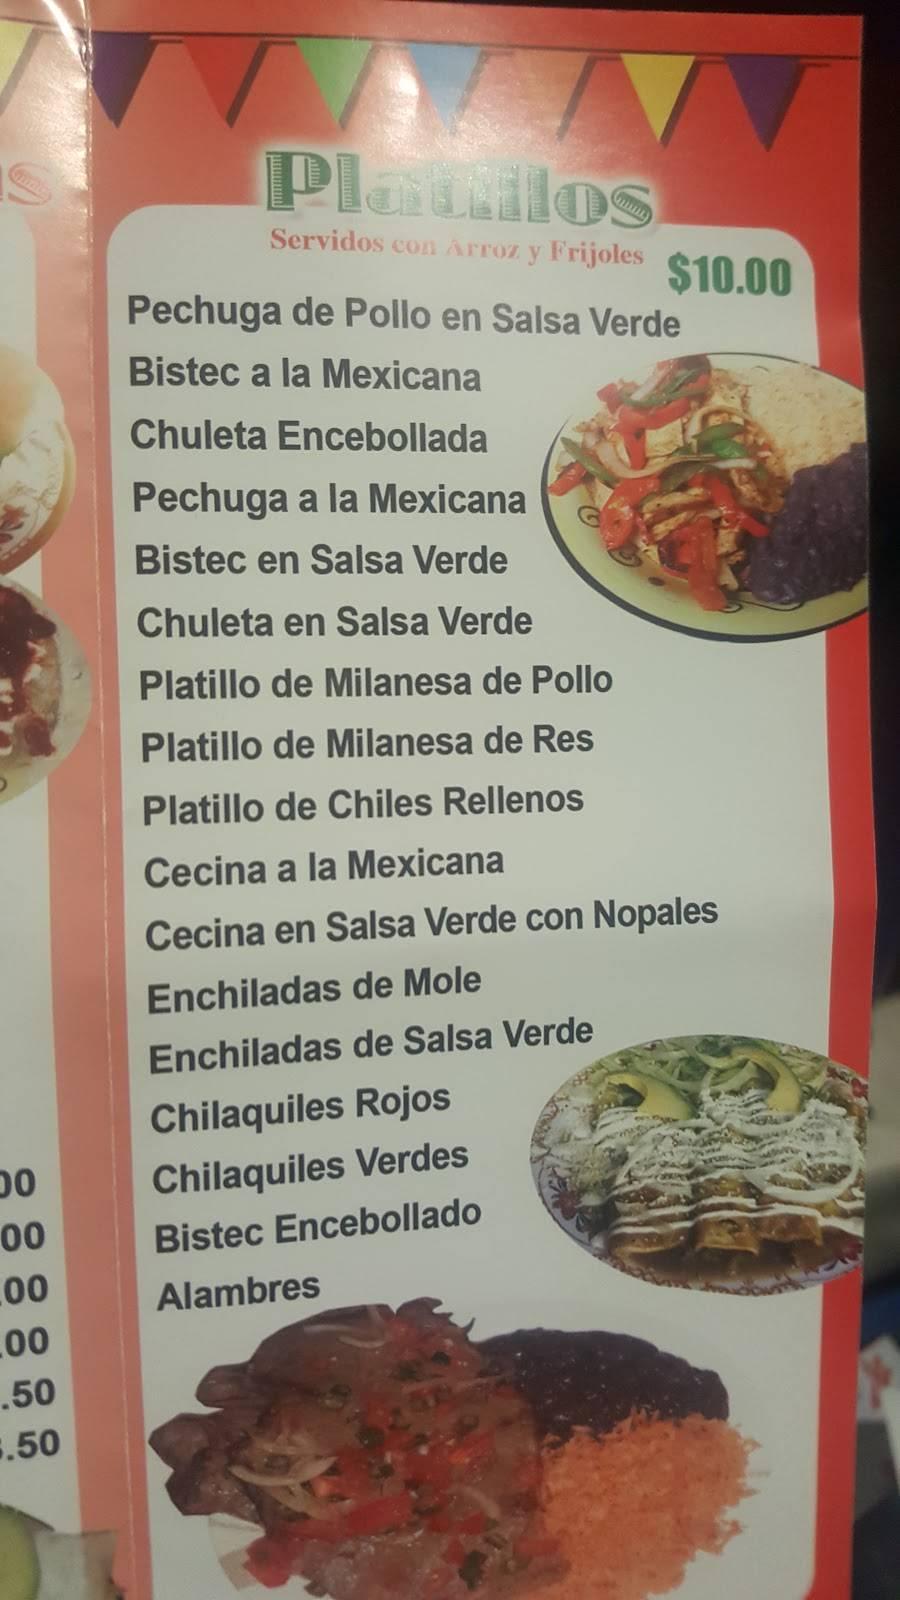 Taqueria El Cebollin   restaurant   1164 Wheeler Ave, Bronx, NY 10472, USA   9174037283 OR +1 917-403-7283